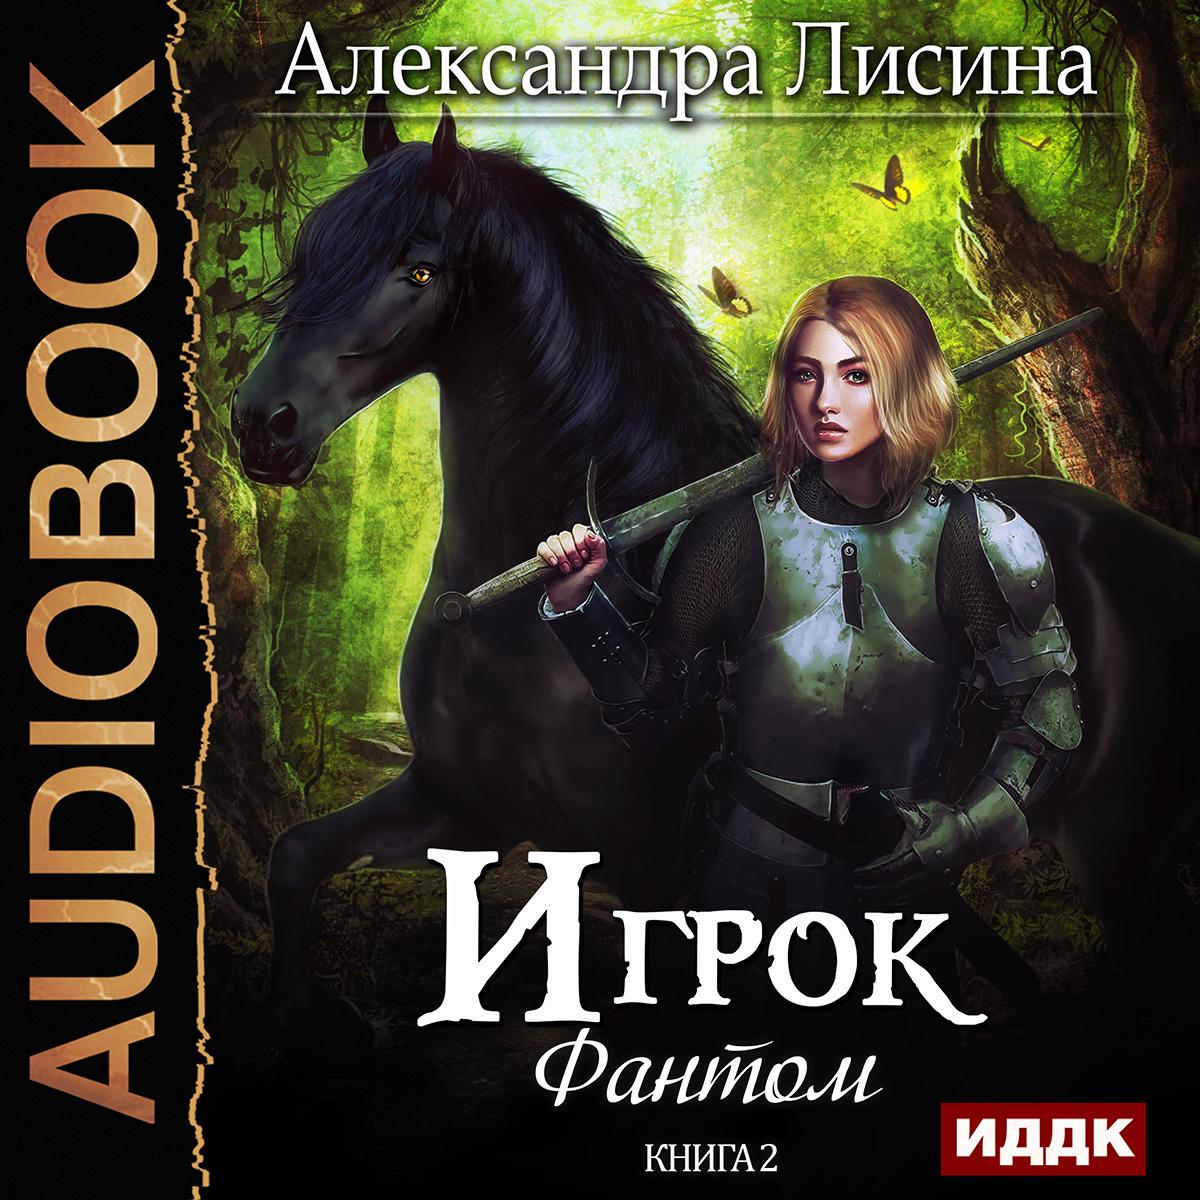 Лисина Александра Игрок: Фантом. Книга 2 (цифровая версия) (Цифровая версия)